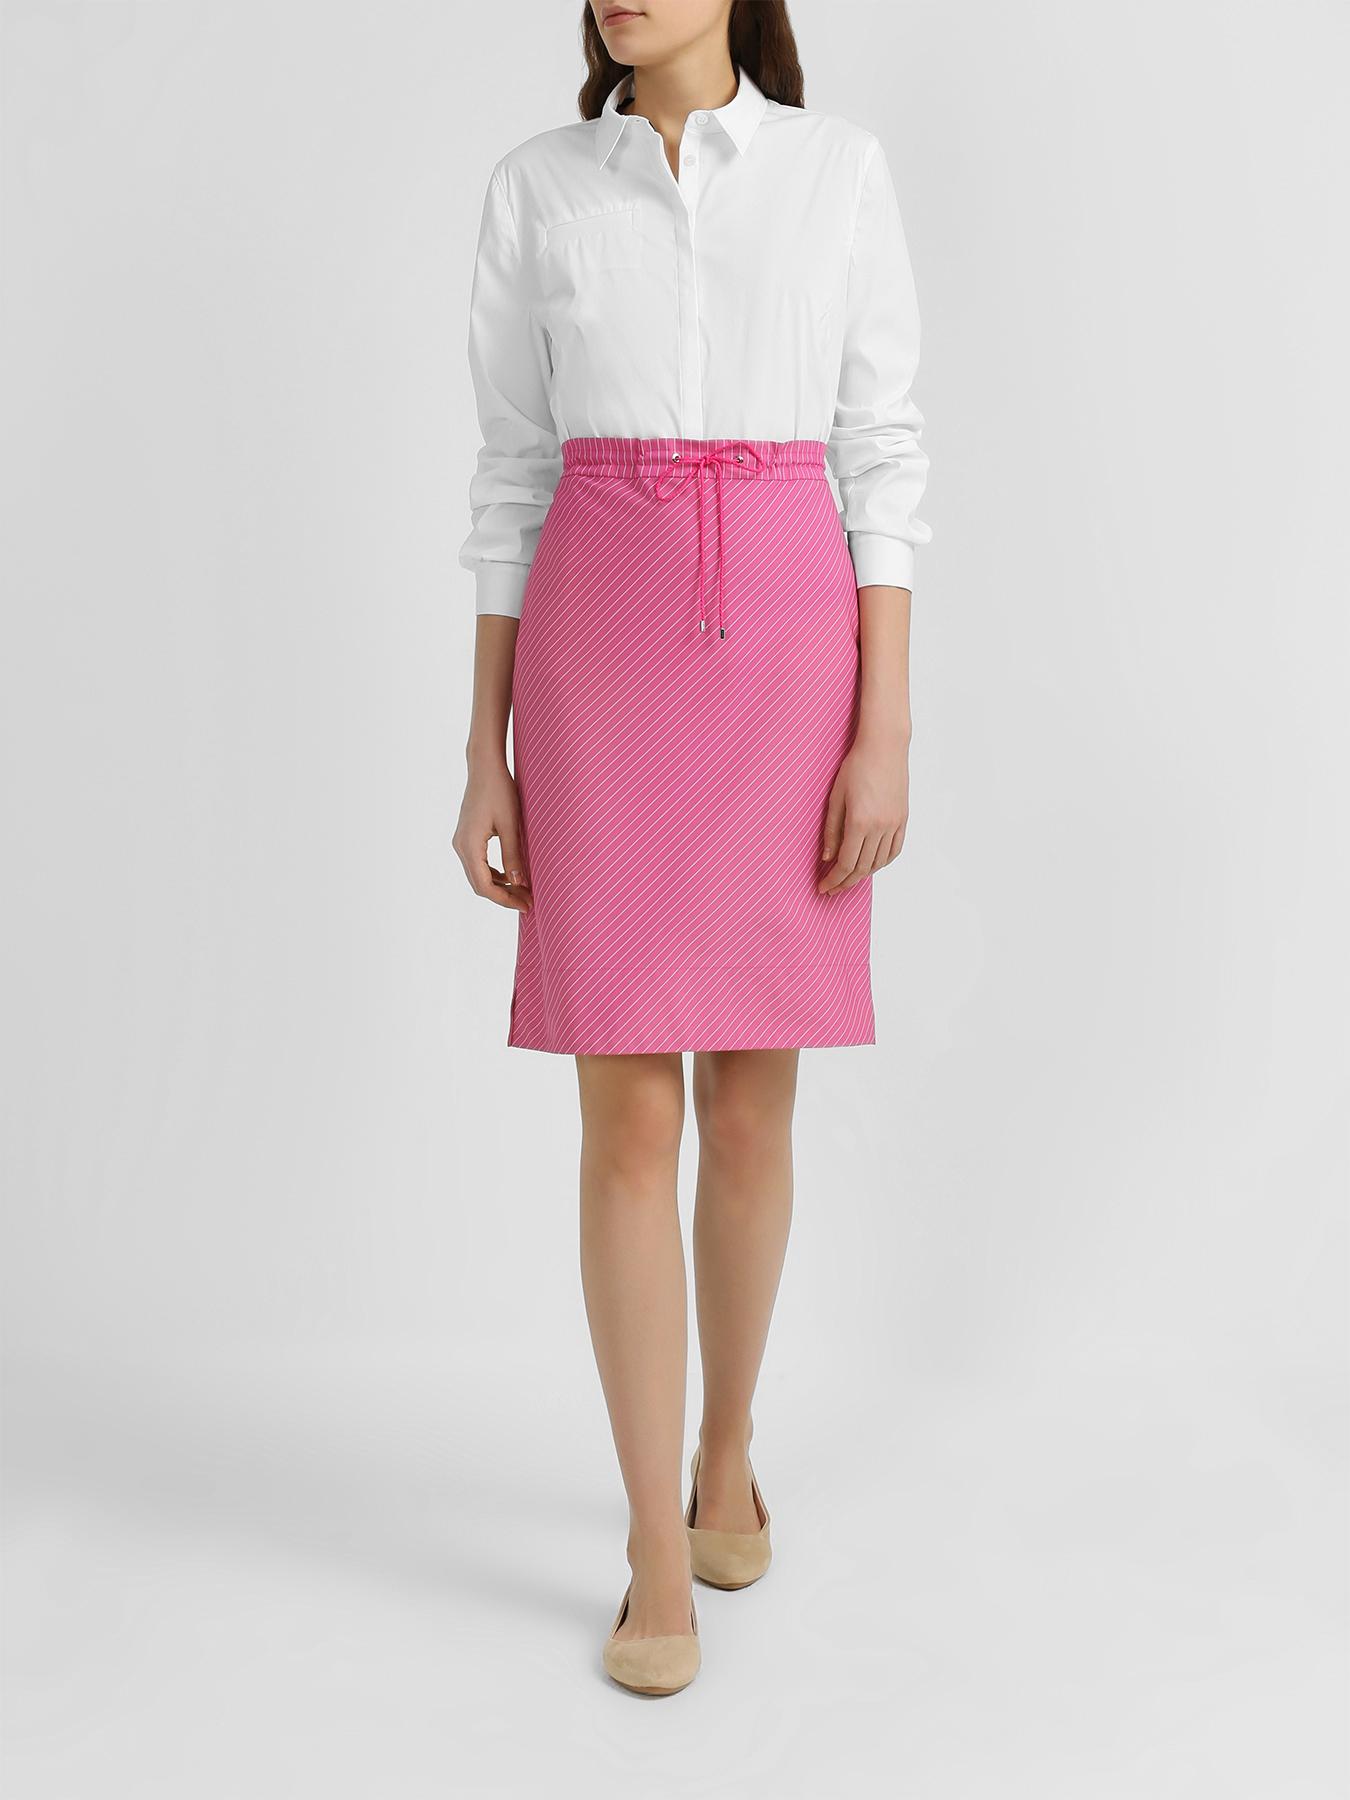 Finisterre Прямая юбка от Finisterre